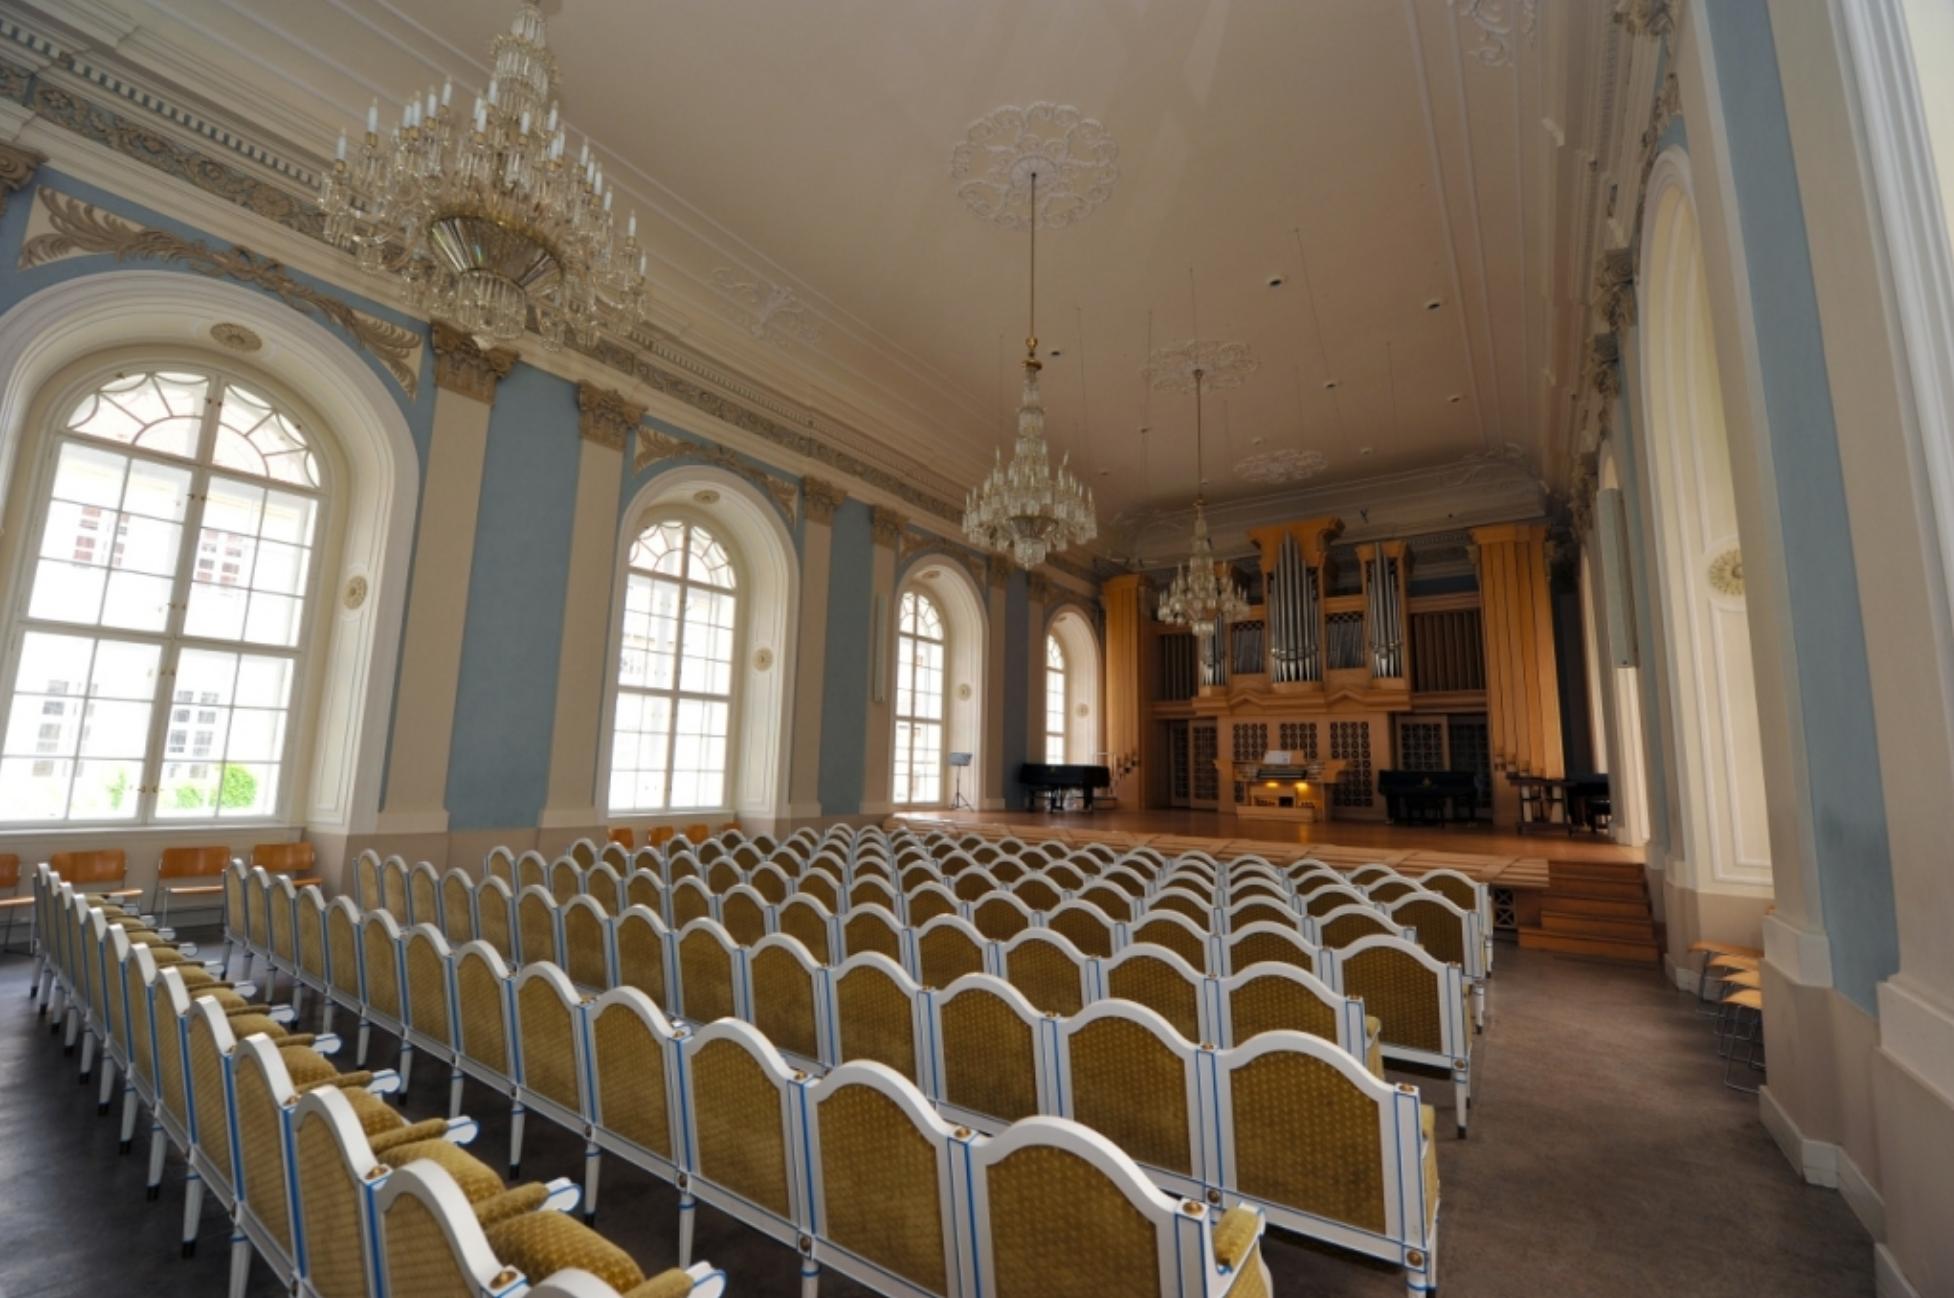 The Bohuslav Martinů Hall